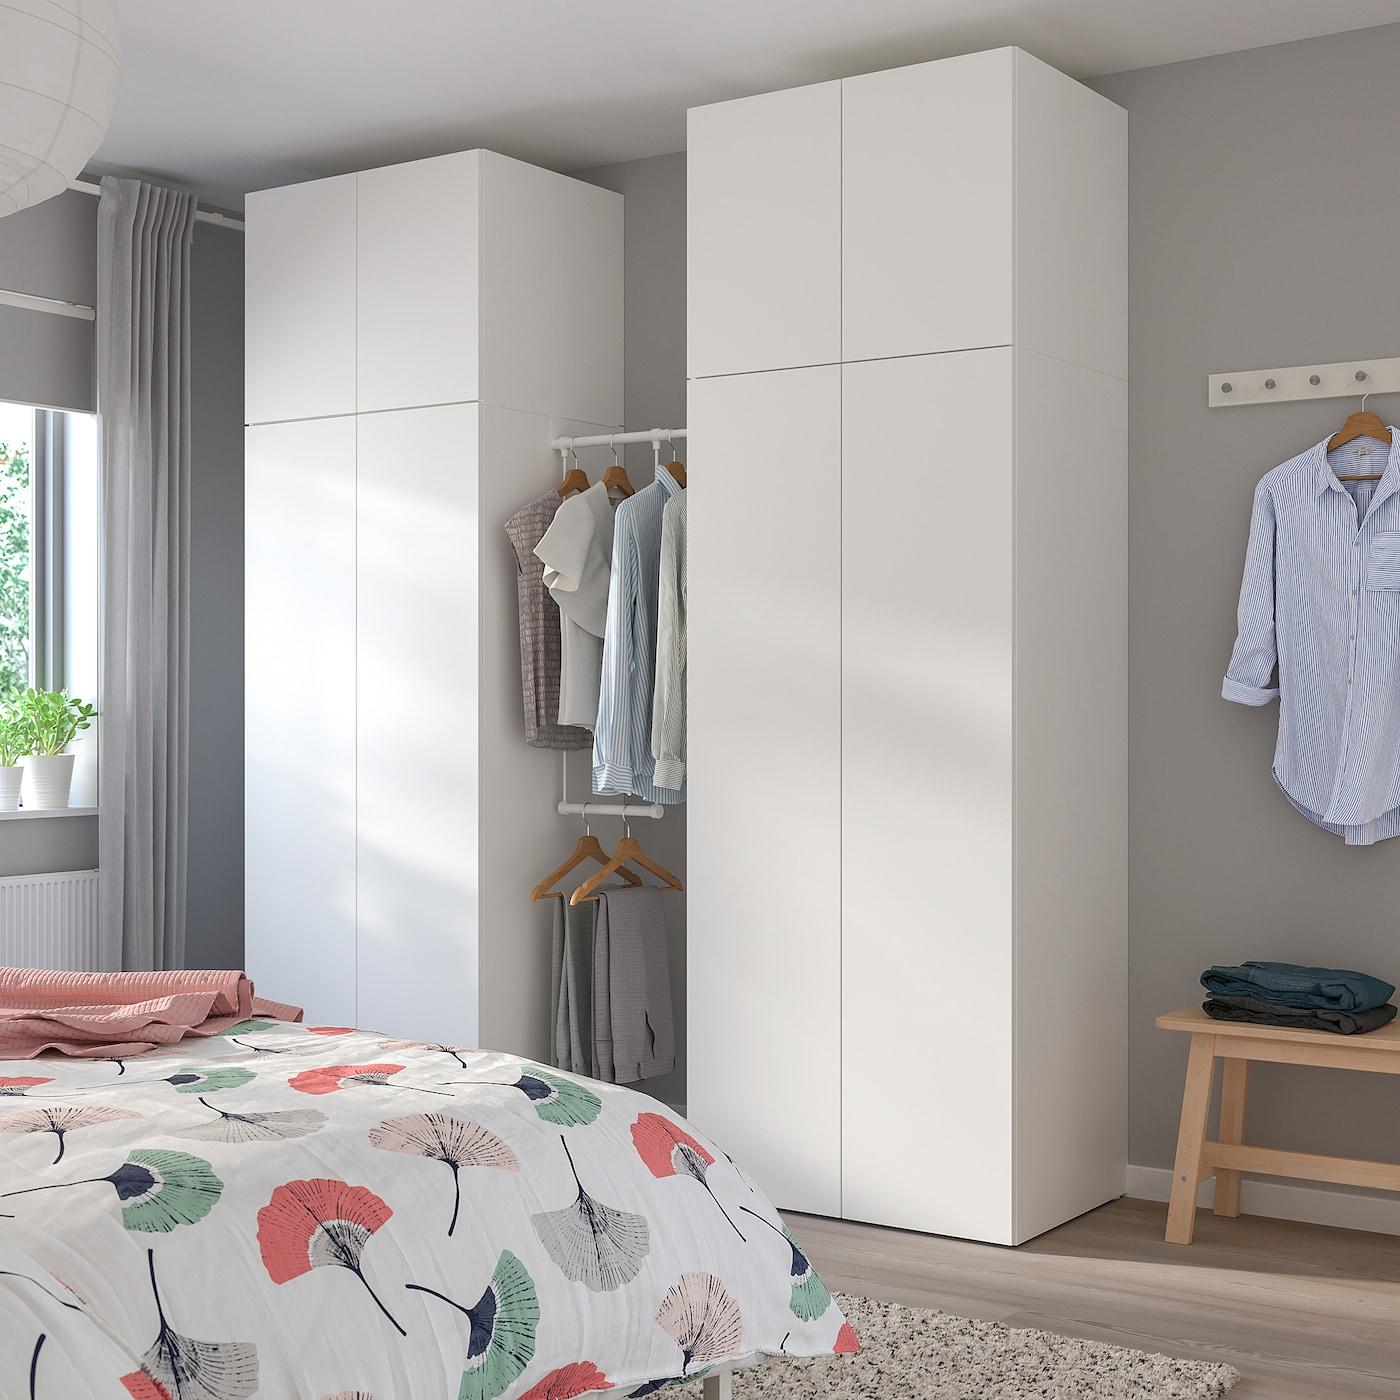 PLATSA دولاب ملابس, أبيض/Fonnes أبيض, 195-220x57x241 سم